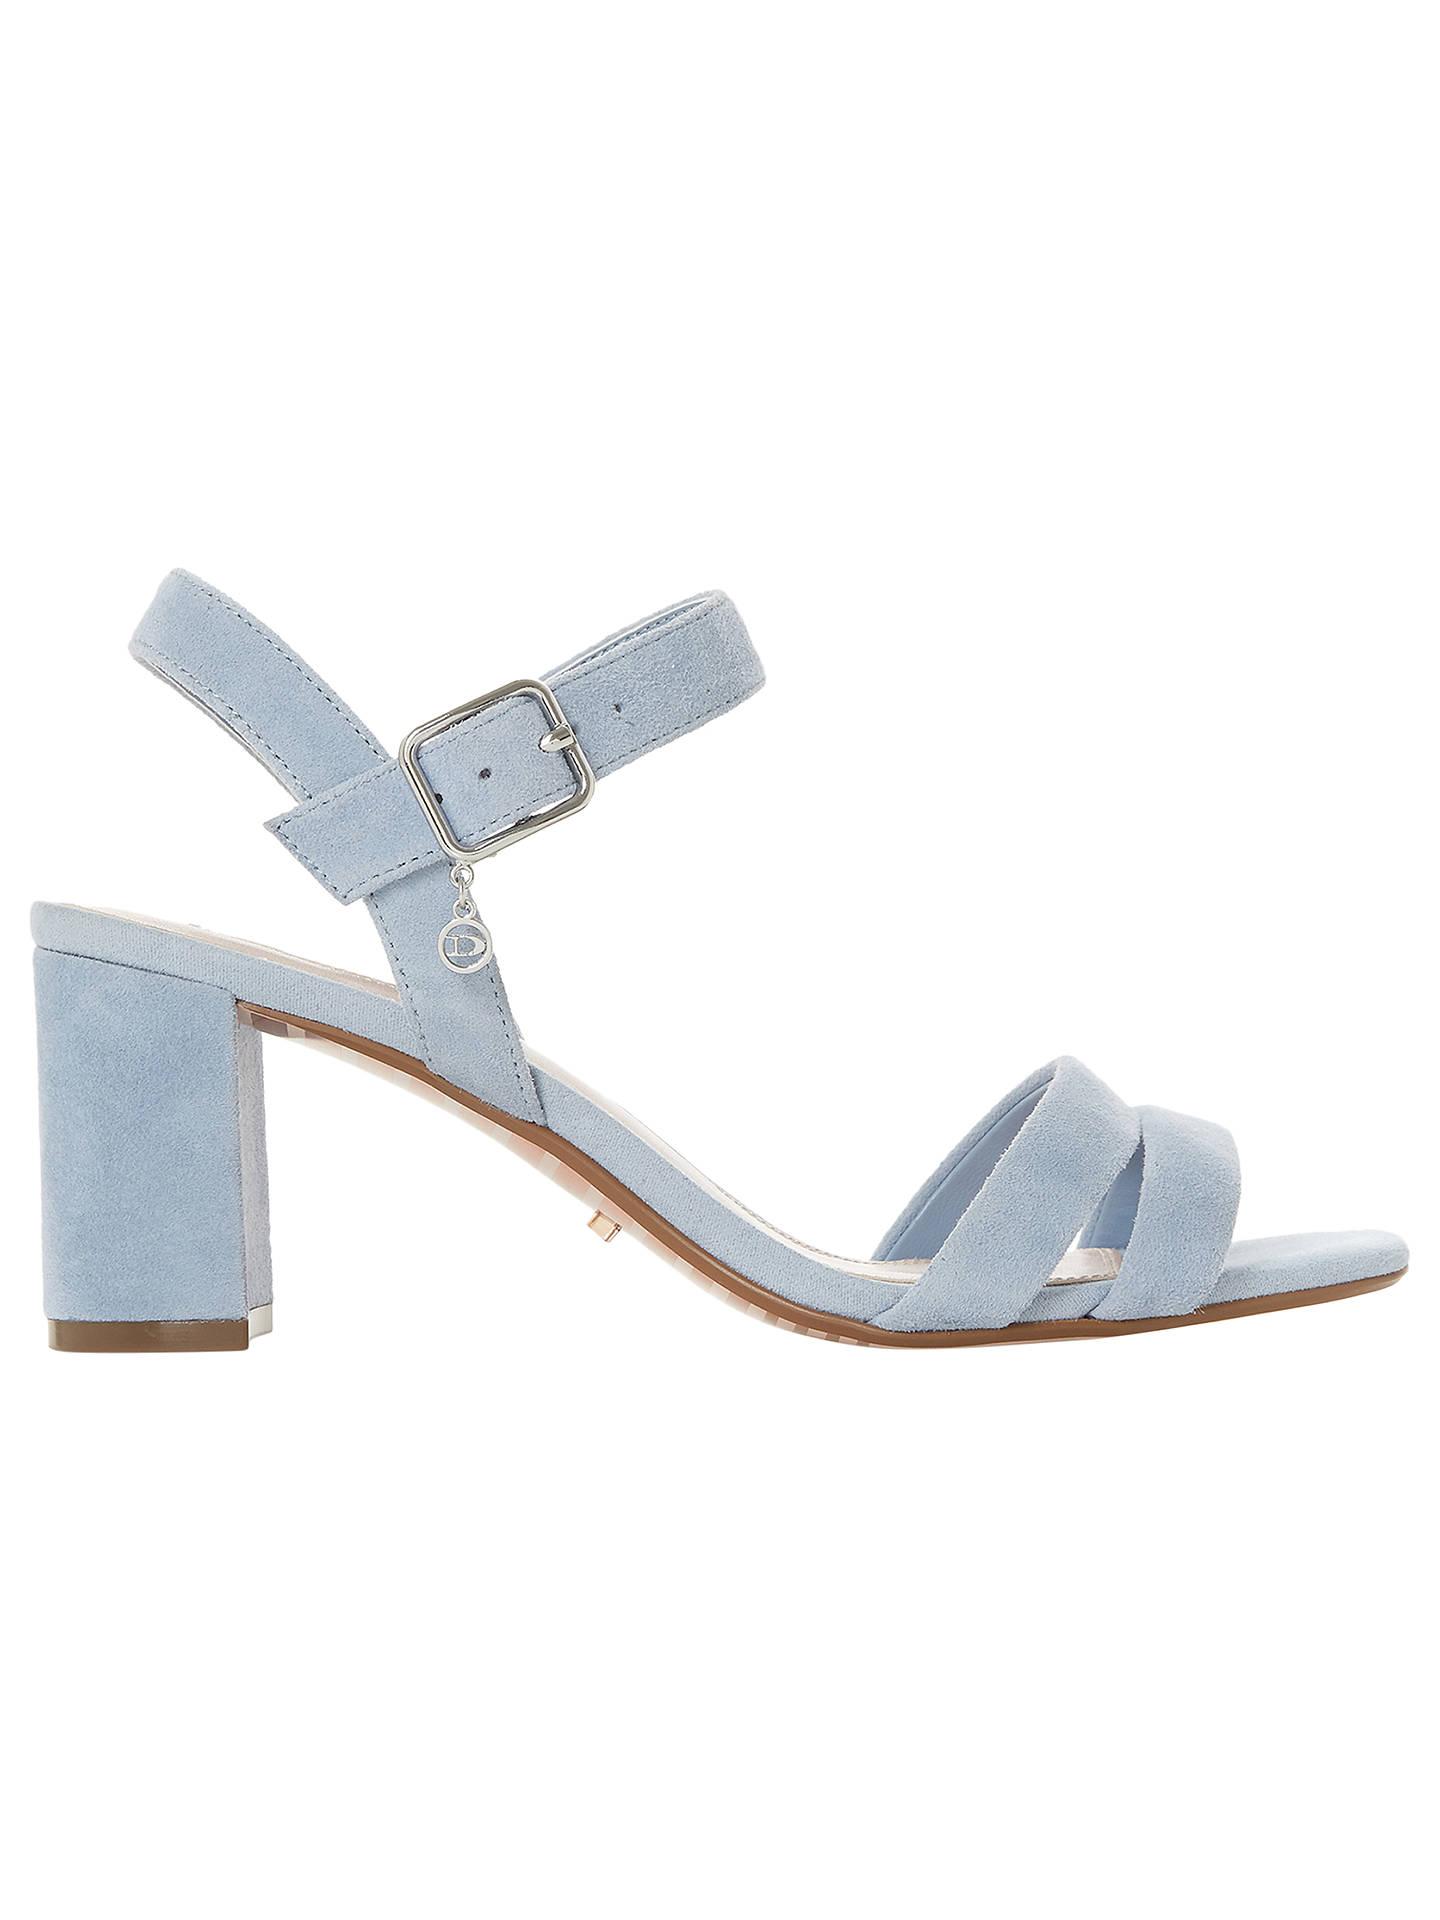 a46bae646 Buy Dune Meggan Block Heel Sandals, Blue Suede, 3 Online at johnlewis.com  ...